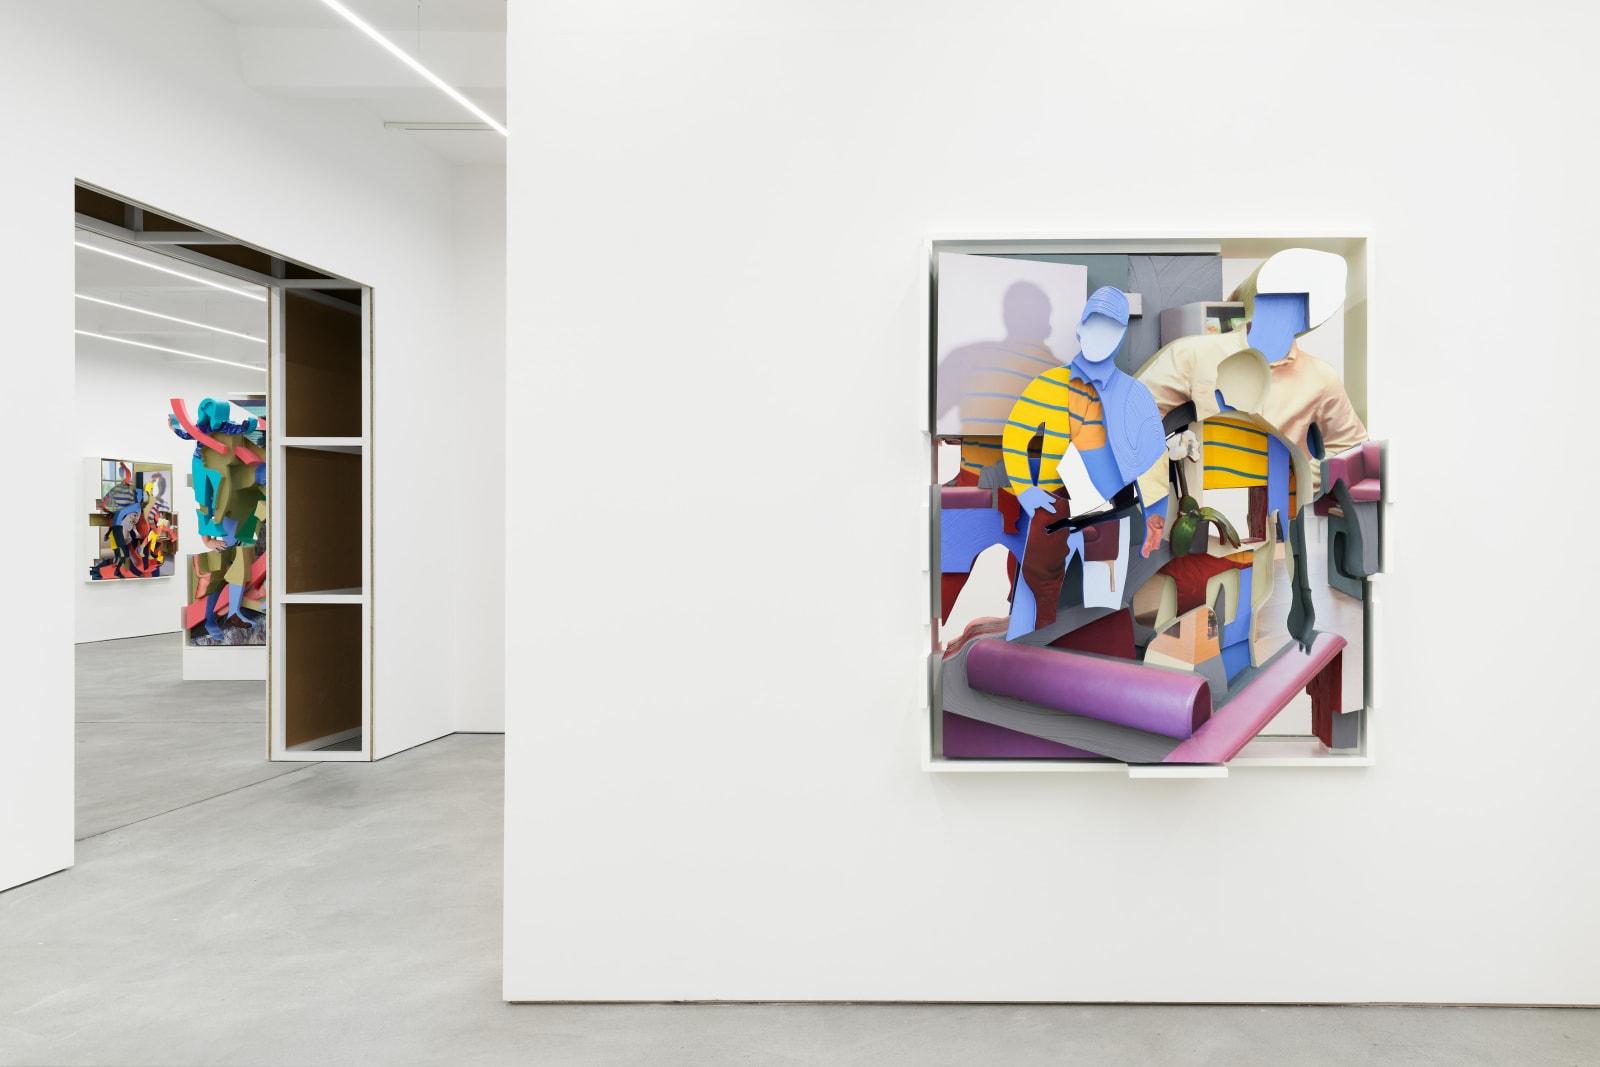 PIETER SCHOOLWERTH exhibition view, Kraupa-Tuskany Zeidler, Berlin, 2019